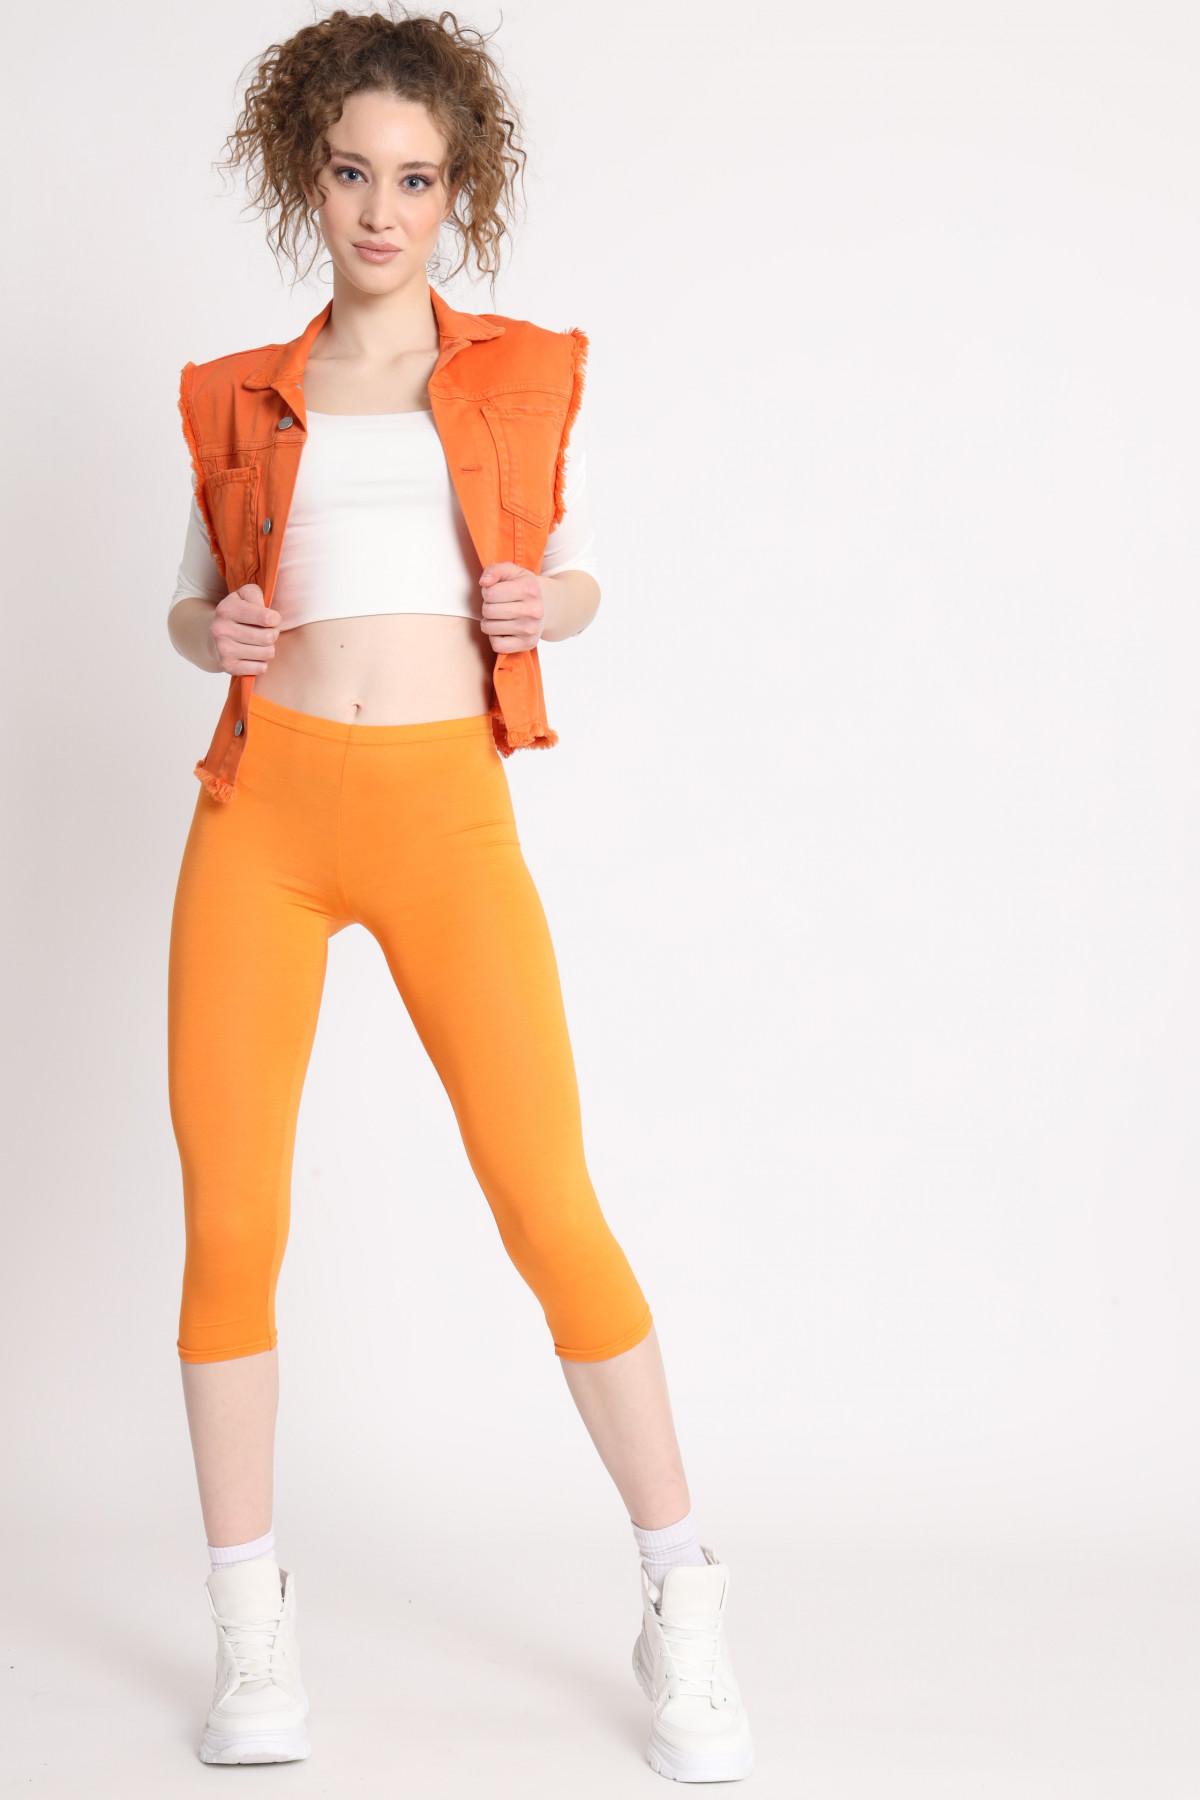 3/4 leggings in solid color